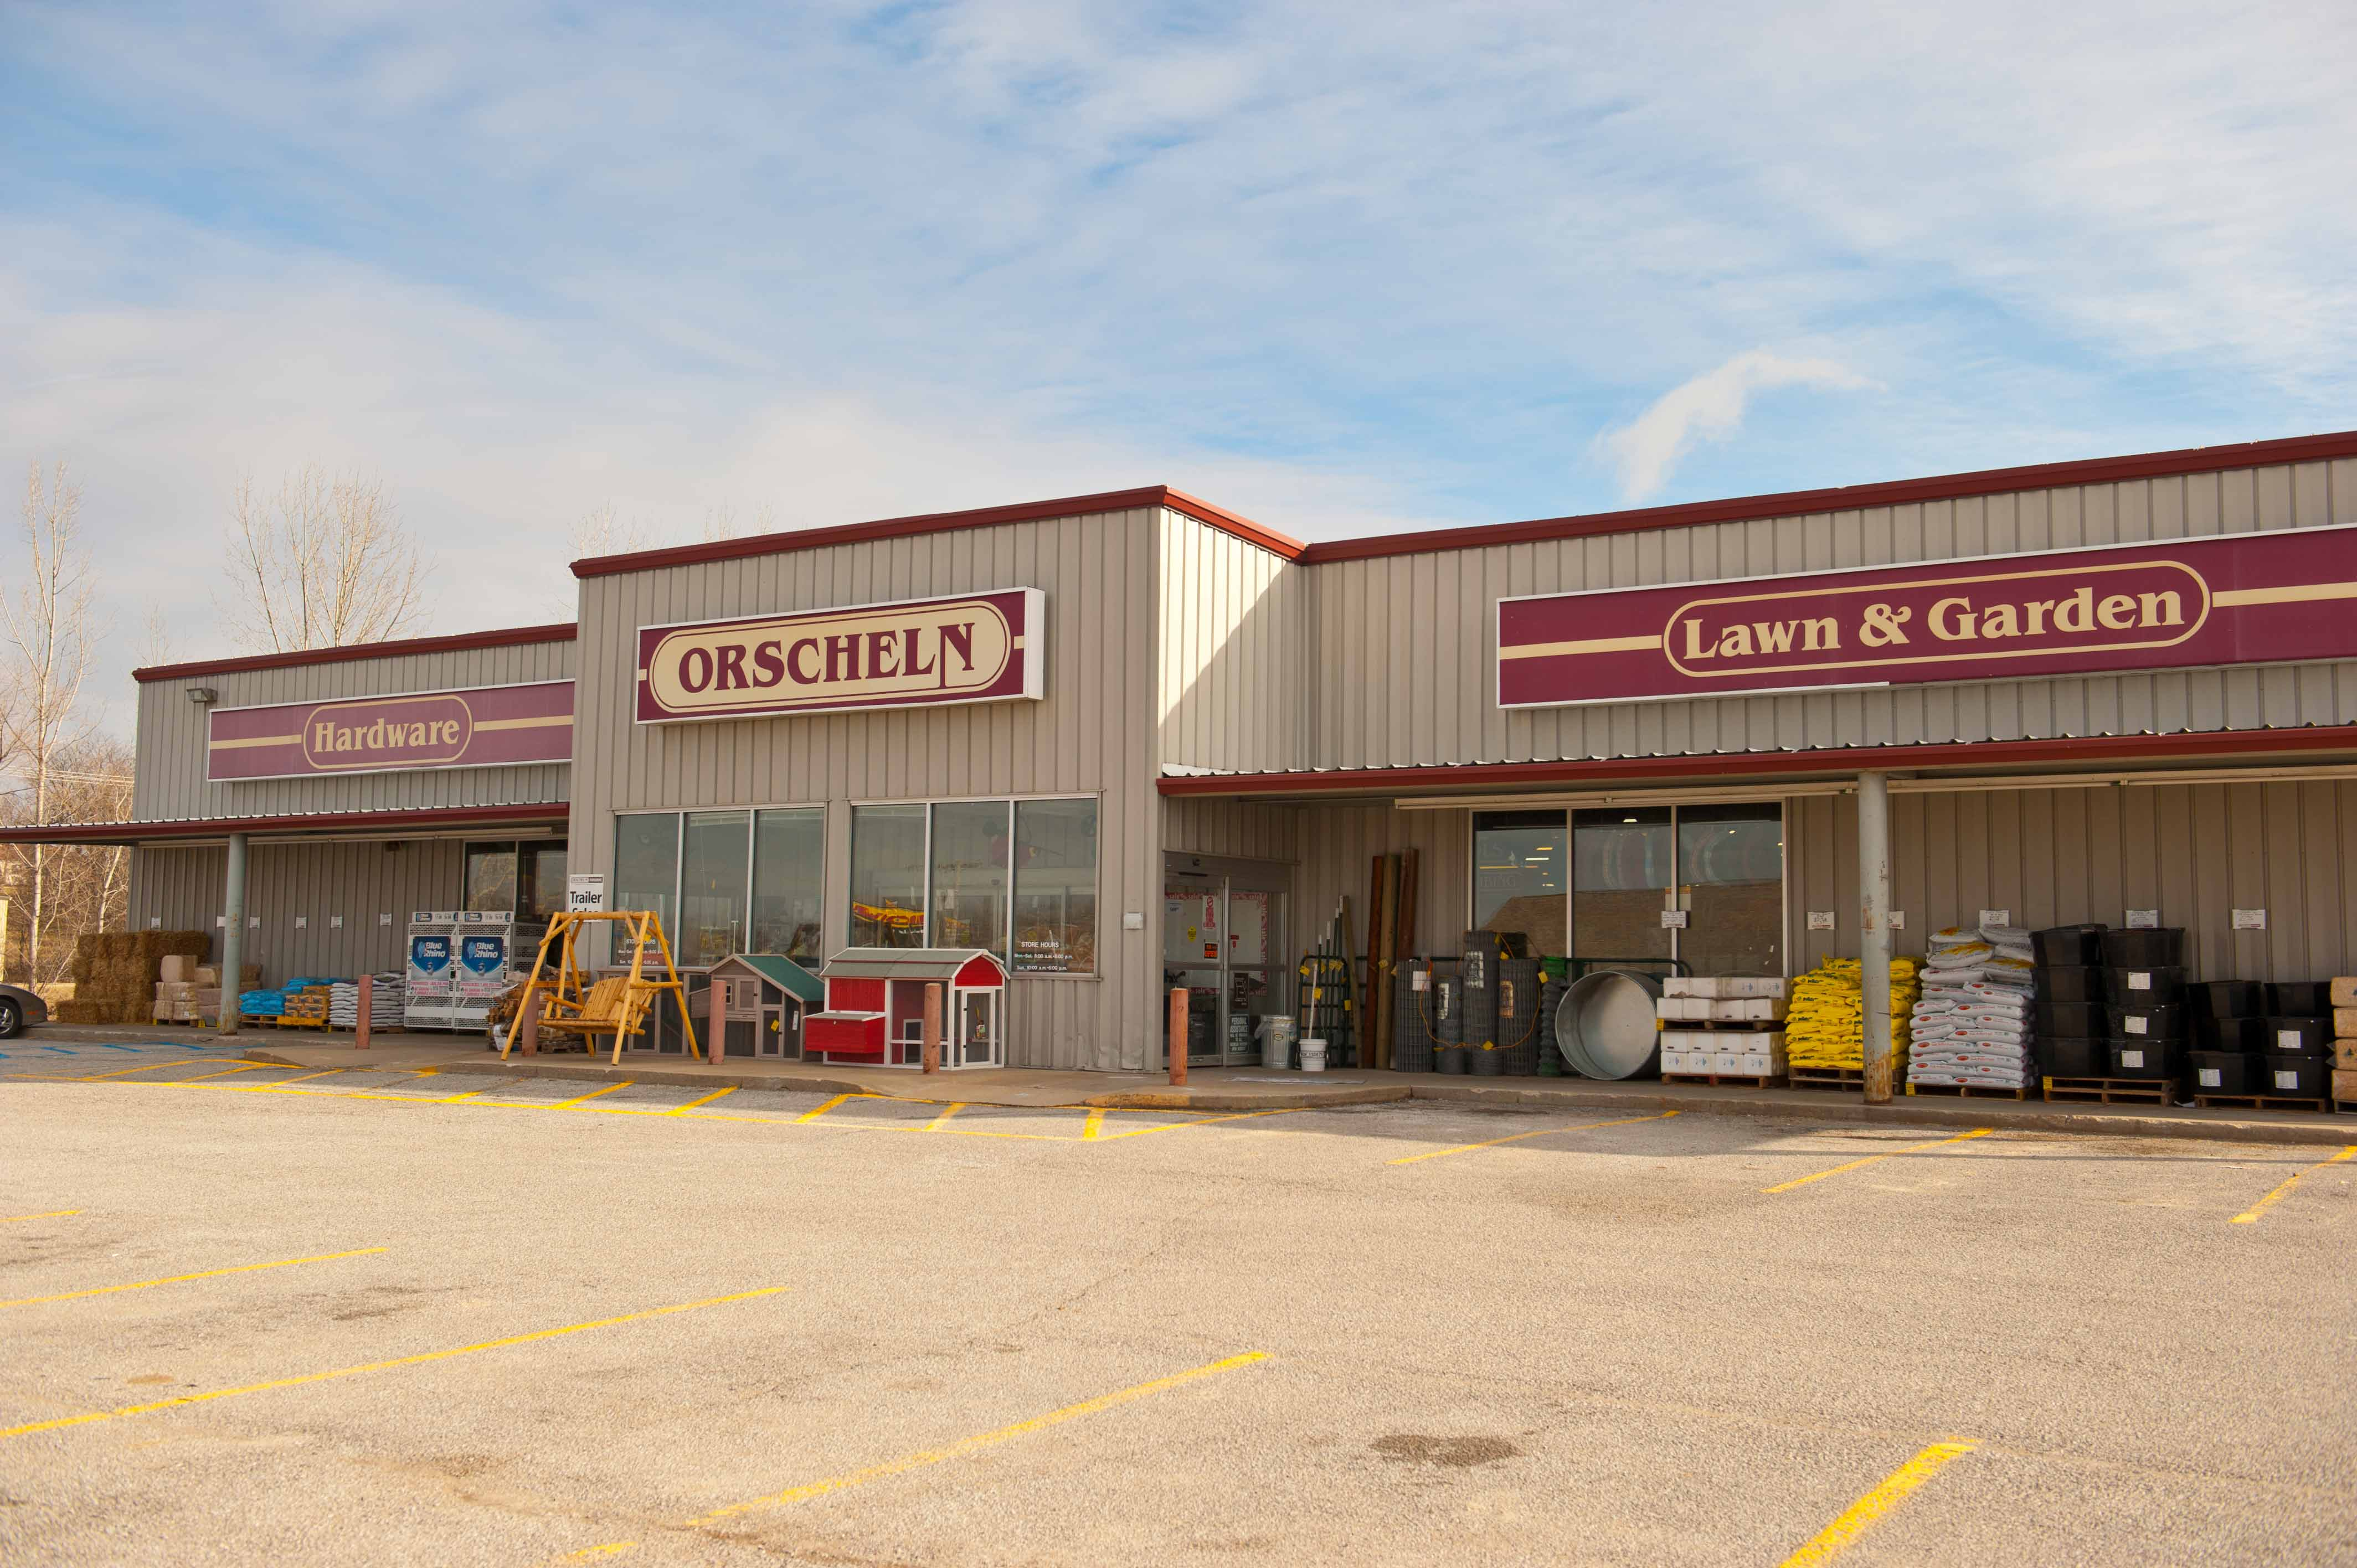 Front view of Orscheln Farm & Home Store in Carrollton, Missouri 64633